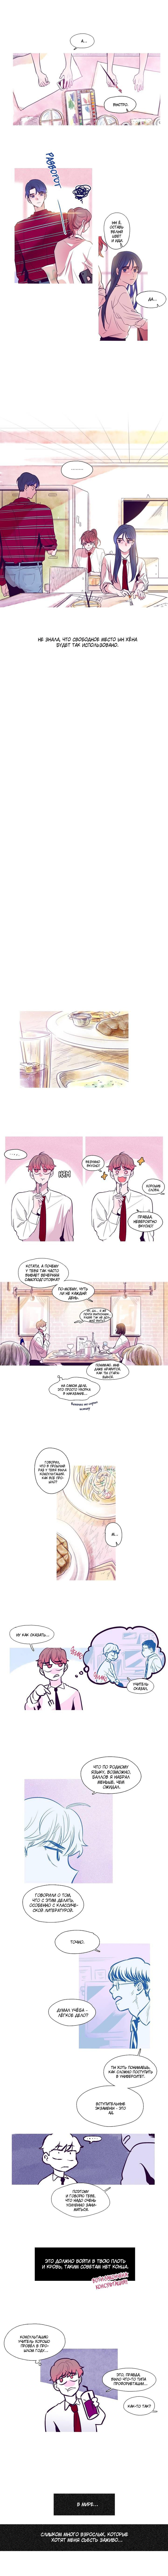 https://r2.ninemanga.com/comics/pic4/35/34723/1363264/1560106159910.jpg Page 4